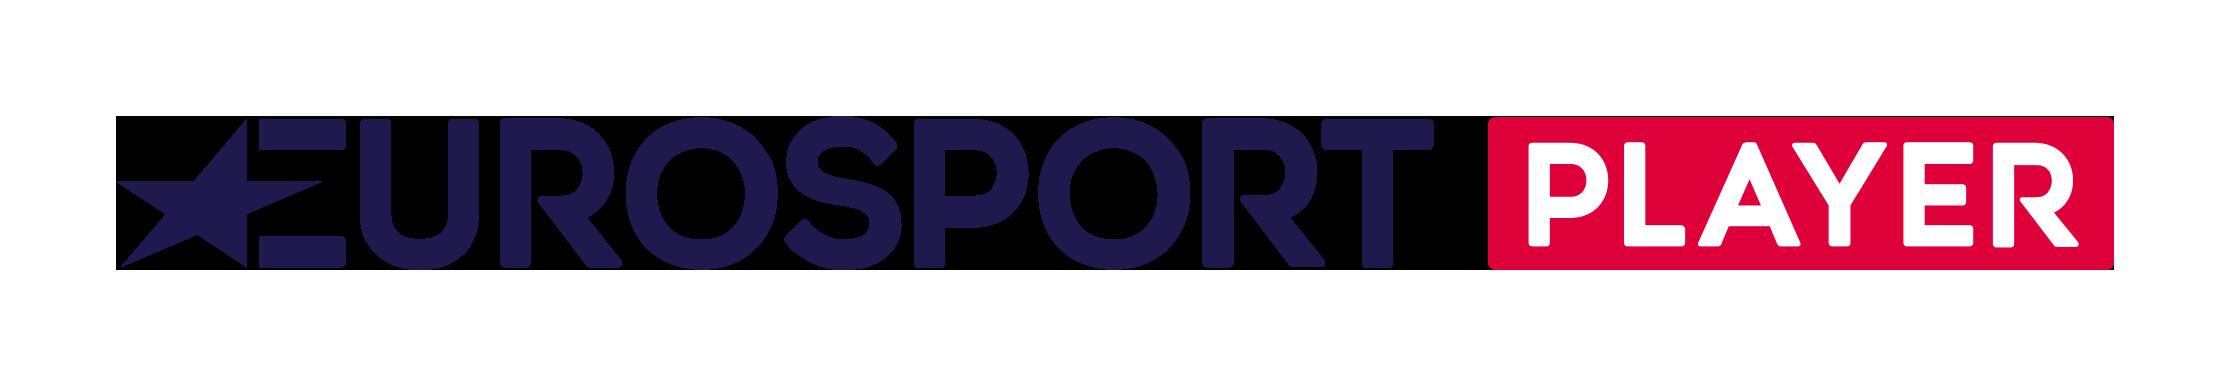 eurosportplayer.dk